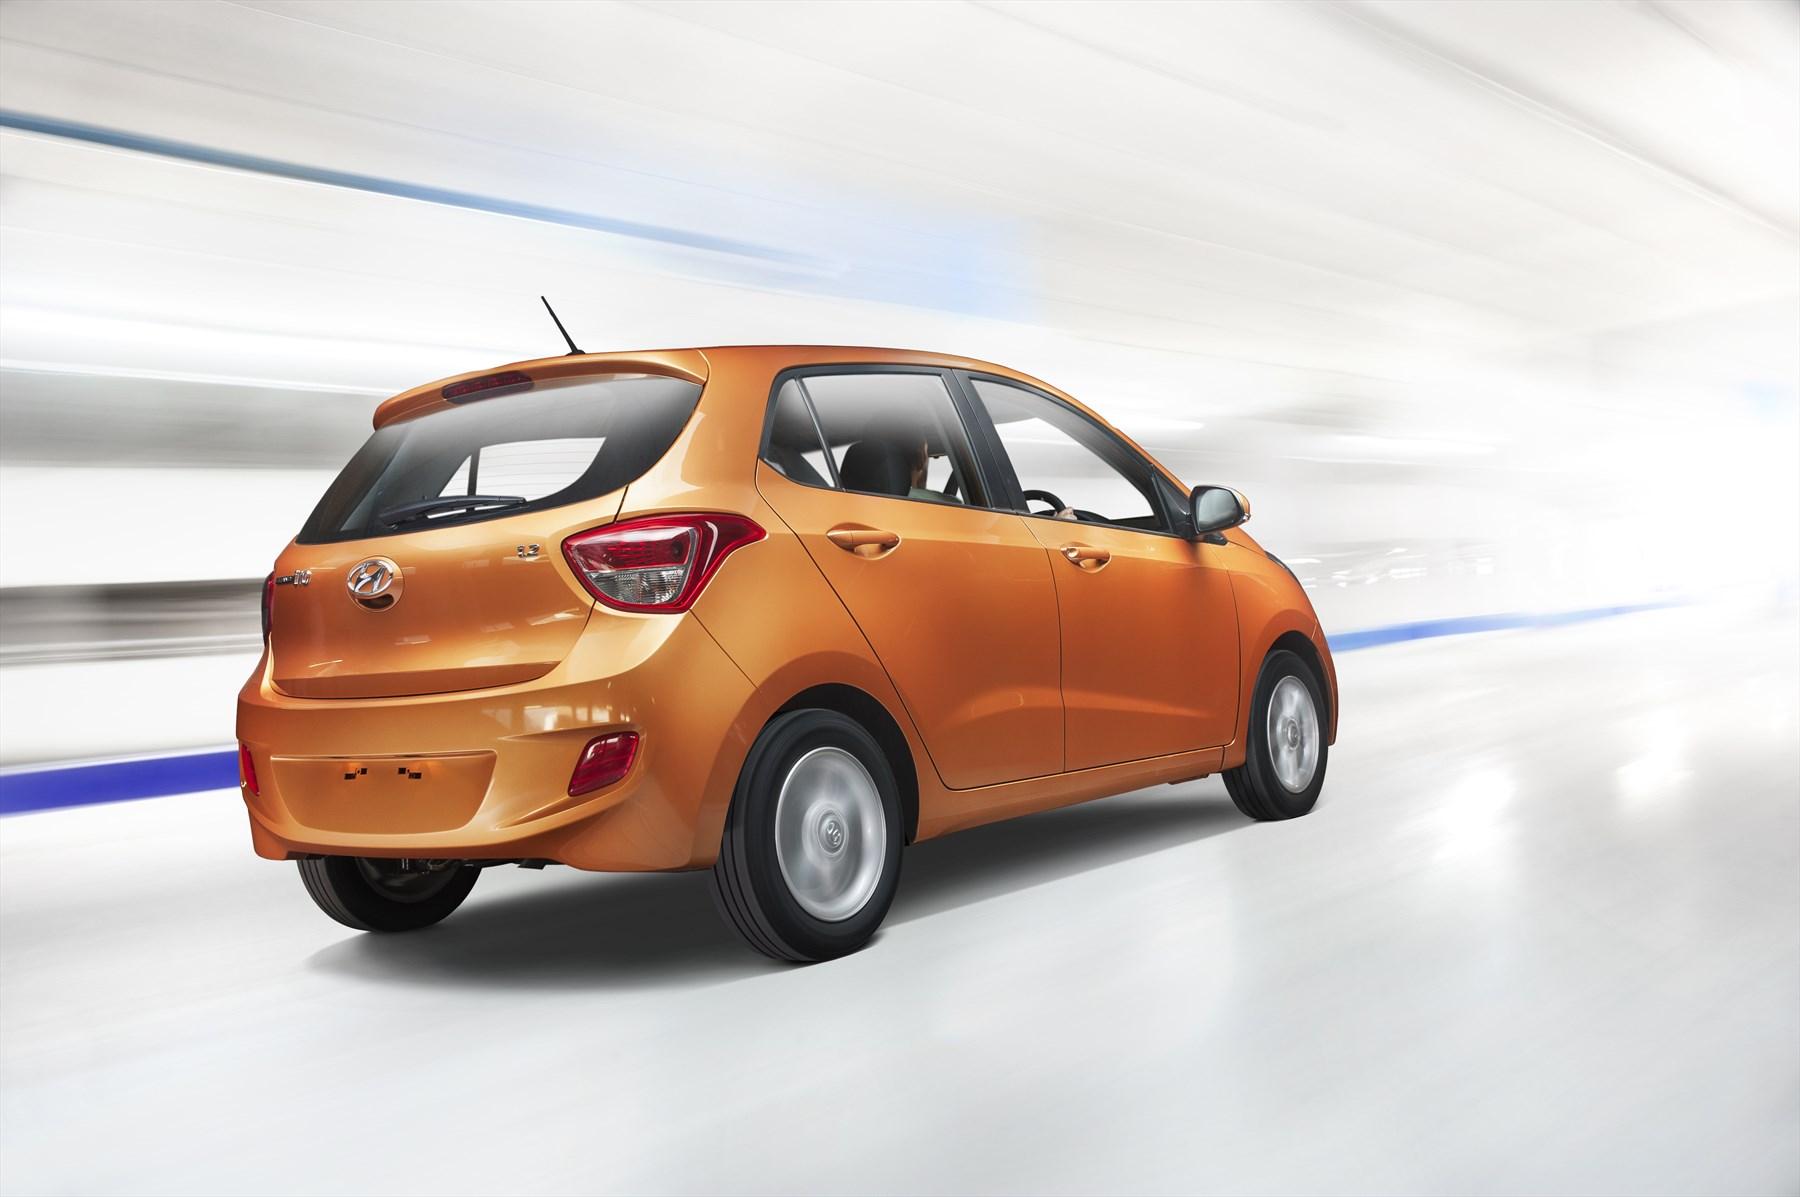 Hyundai i10 Makes Grand Entrance: Latest News